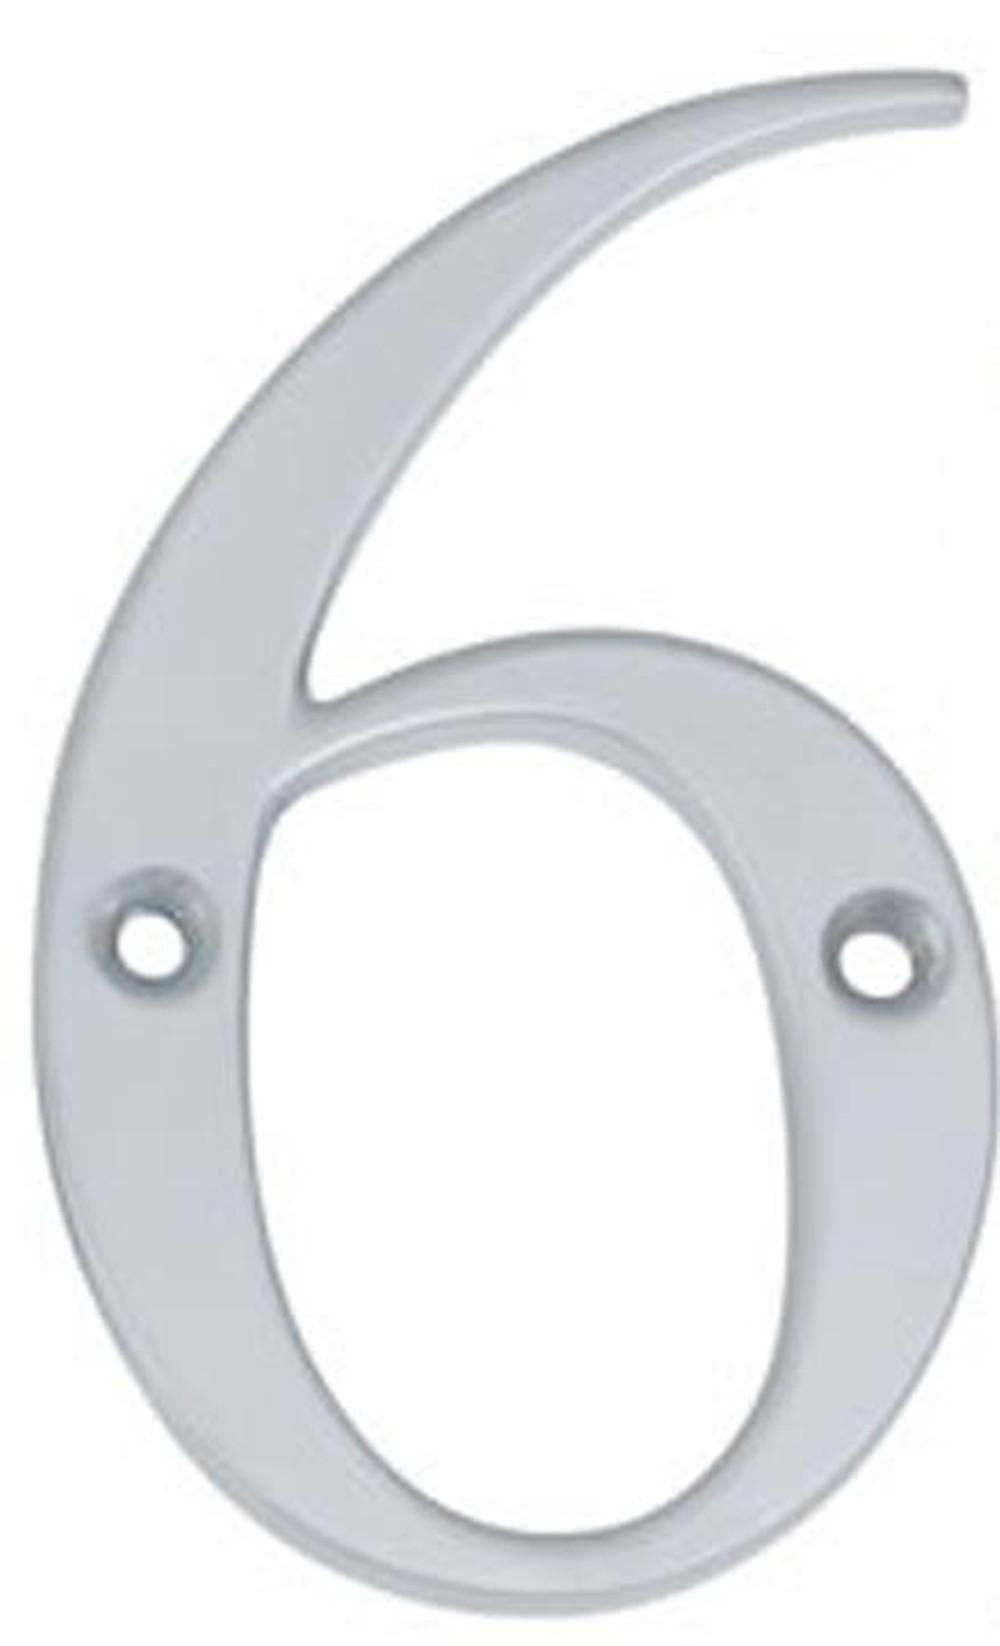 loose-chrome-numeral-number-6-.jpg